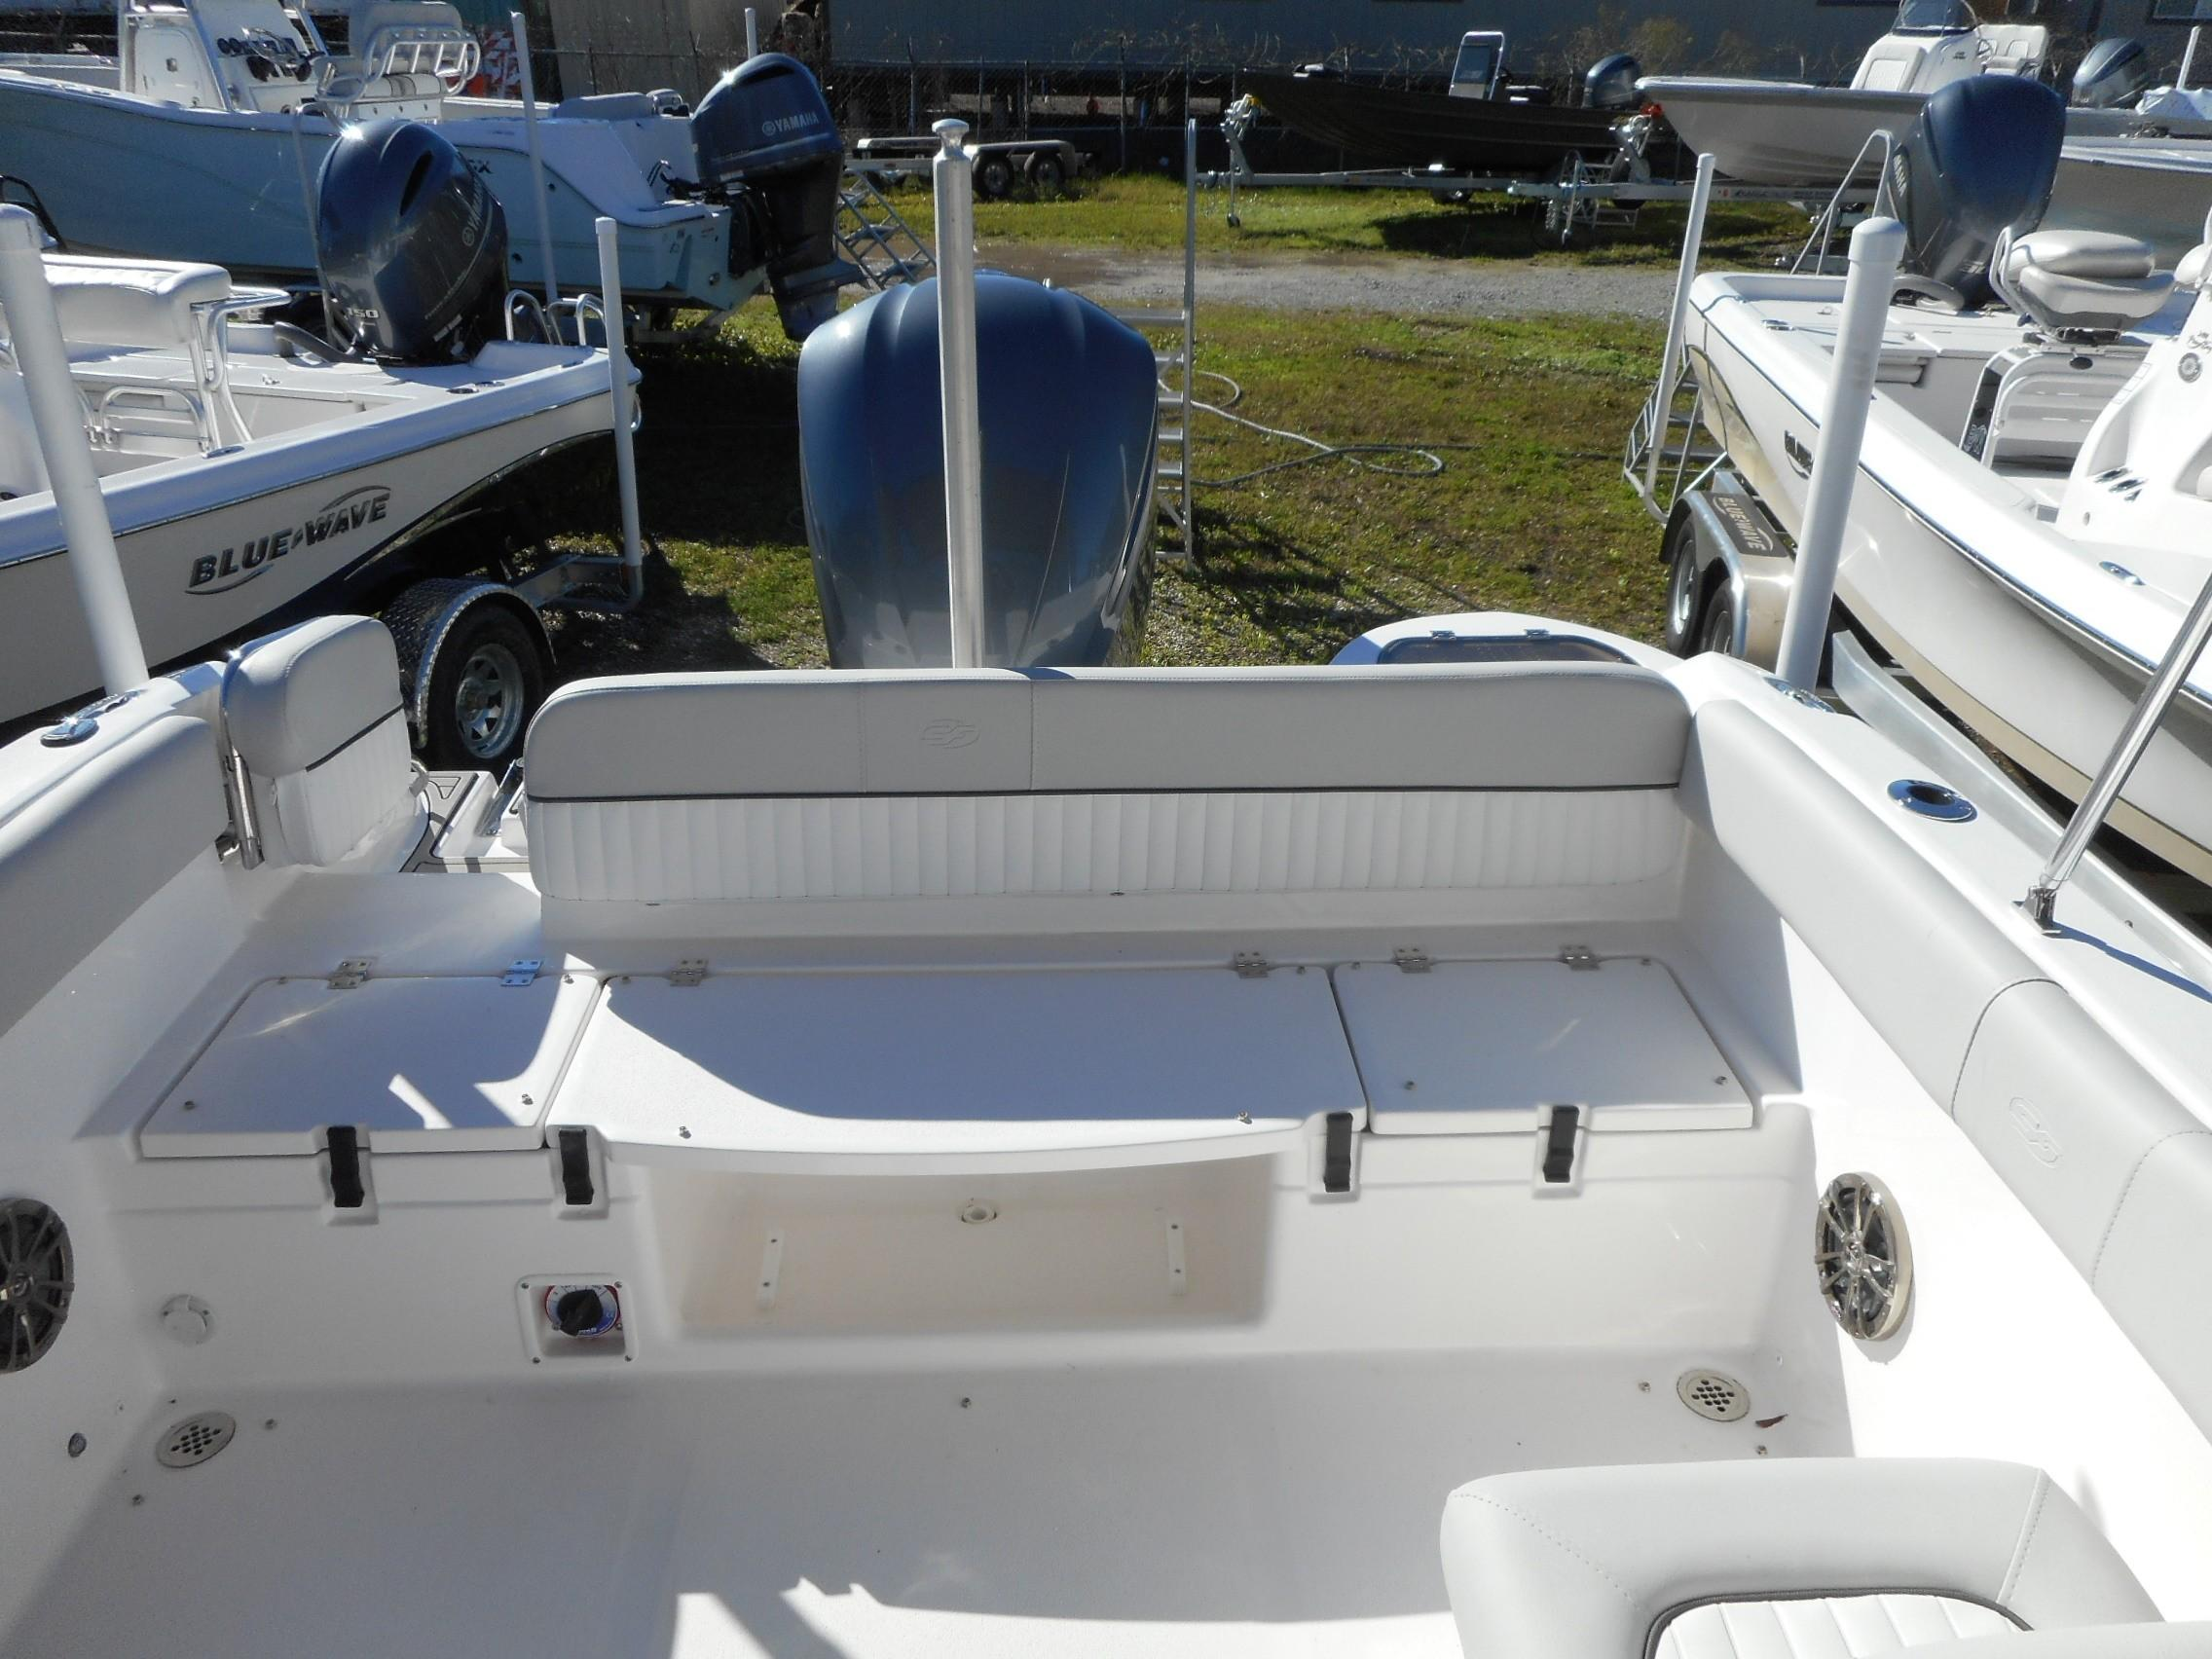 New  2019 22.33' Sea Fox 226 Traveler Dual Console in Slidell, Louisiana